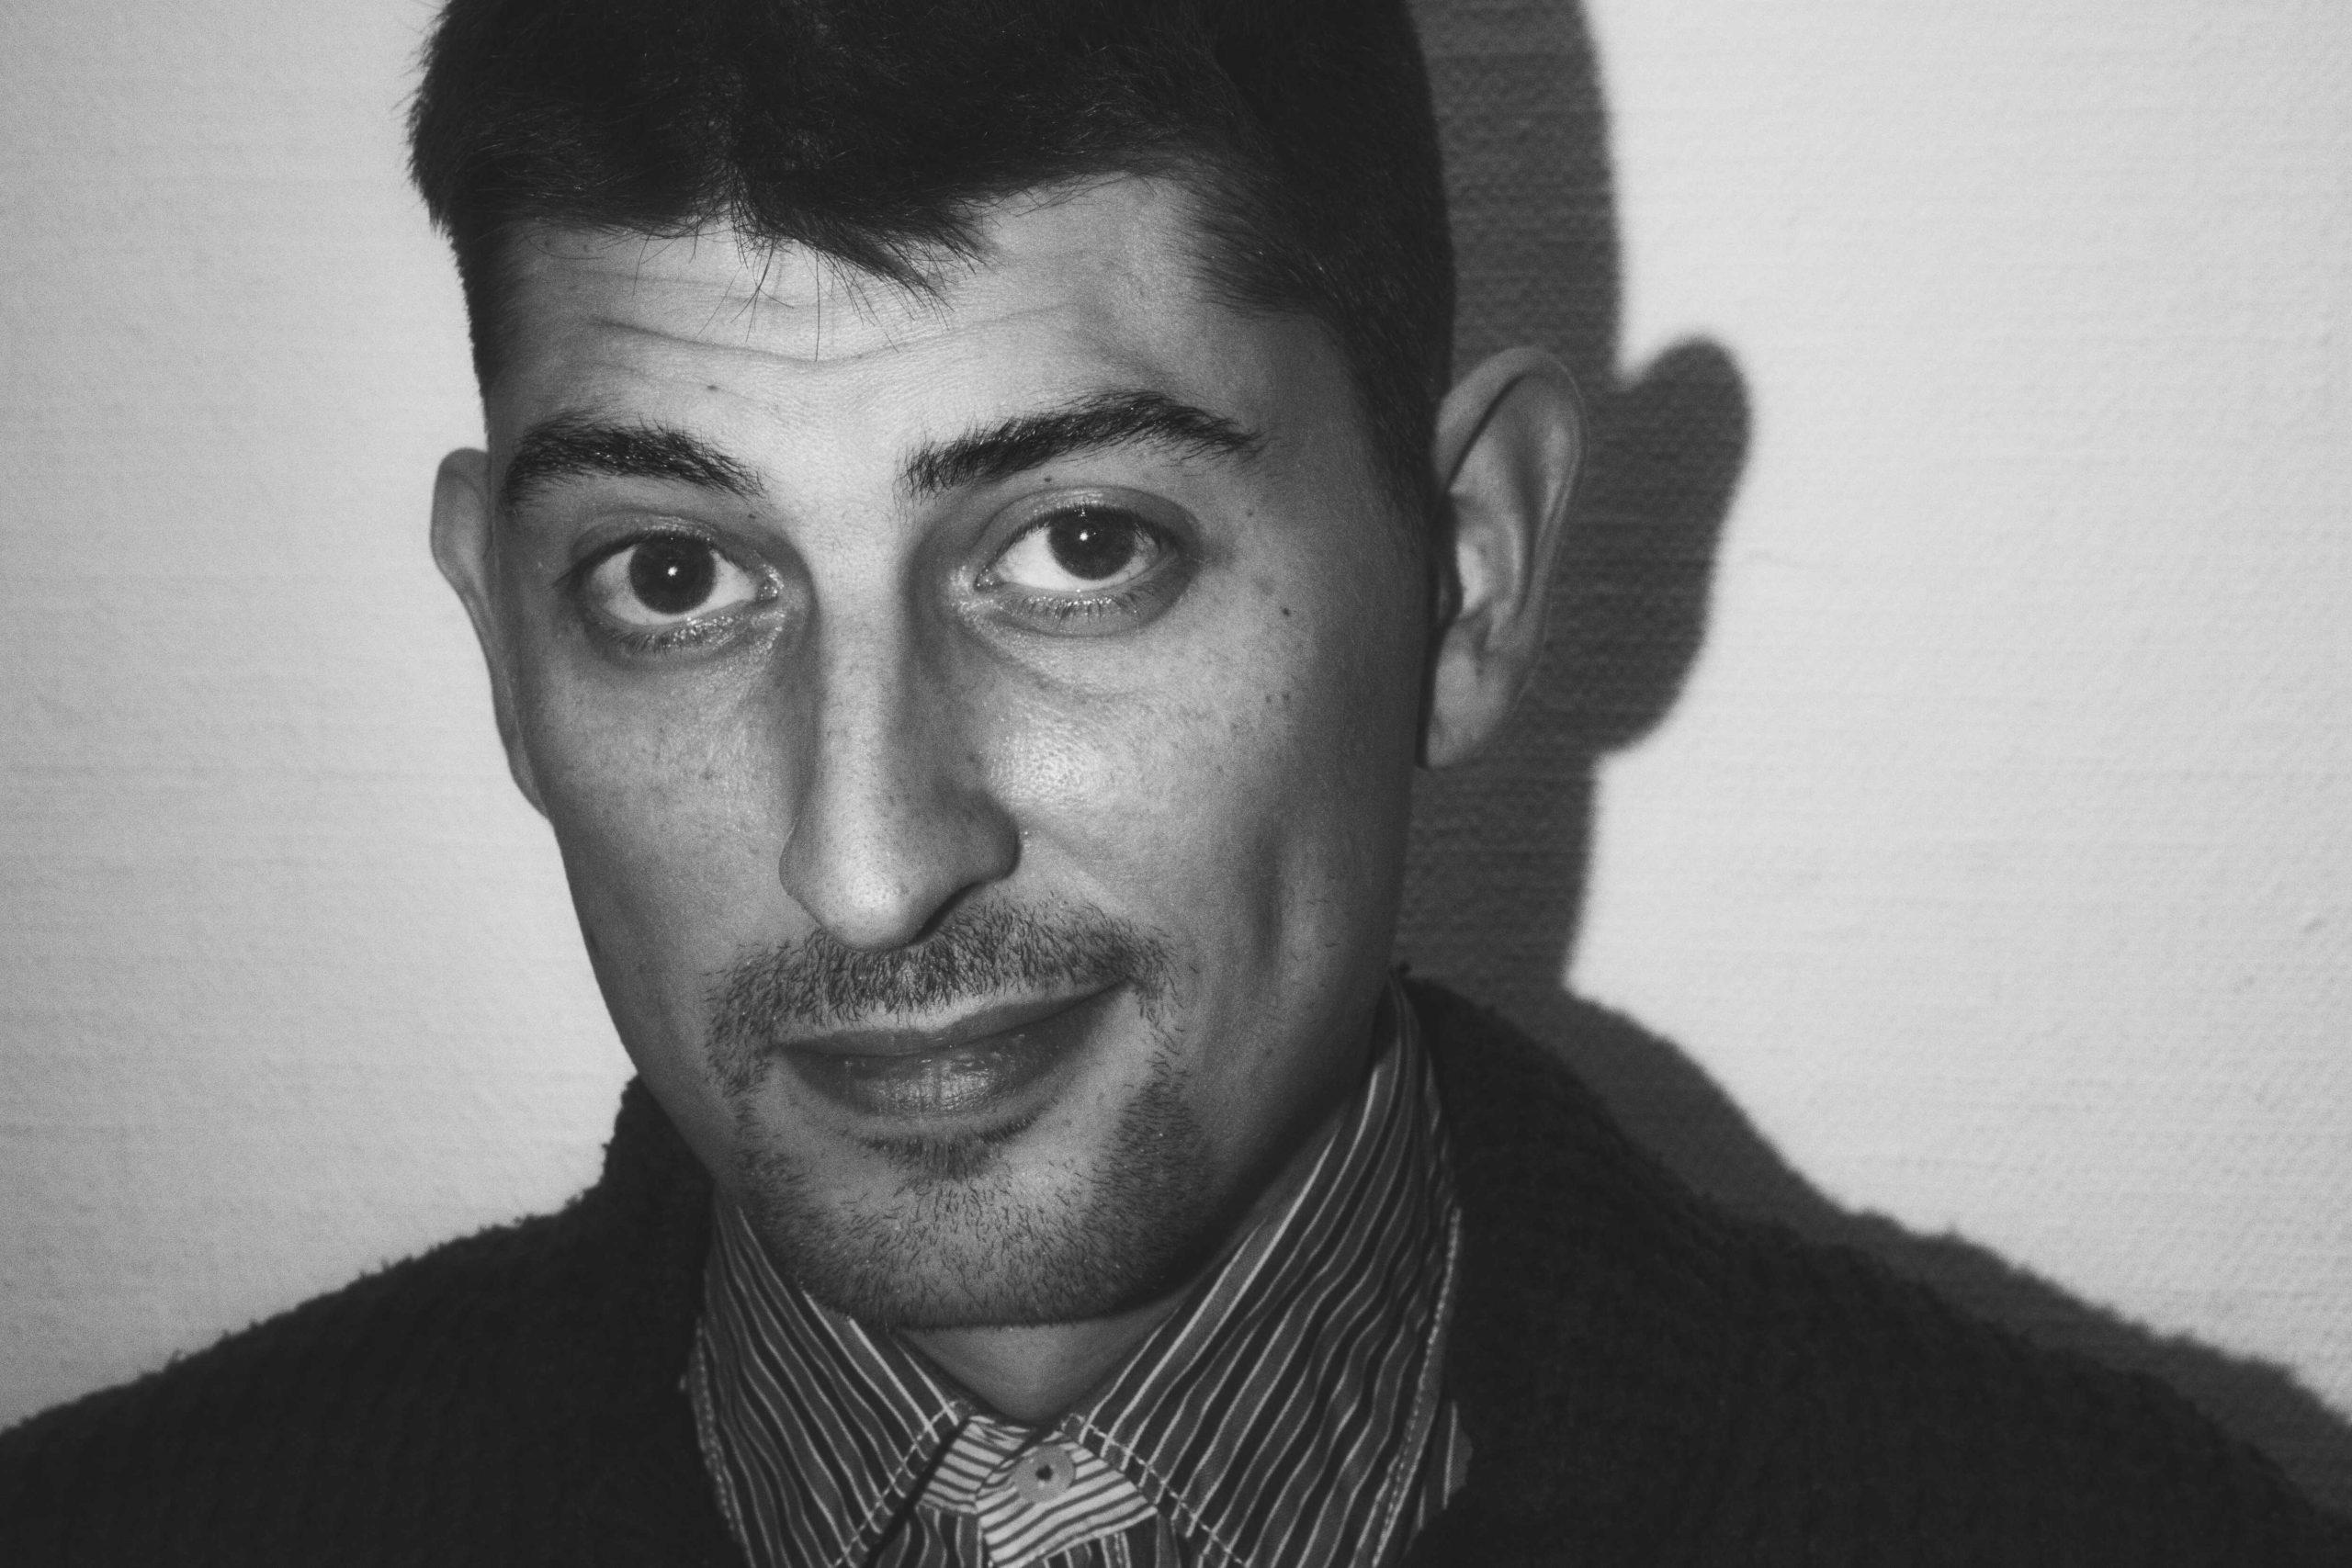 Bastian Peter, fine art street photographer based in Basel, Switzerland. Co-Founder of swissstreetcollective.